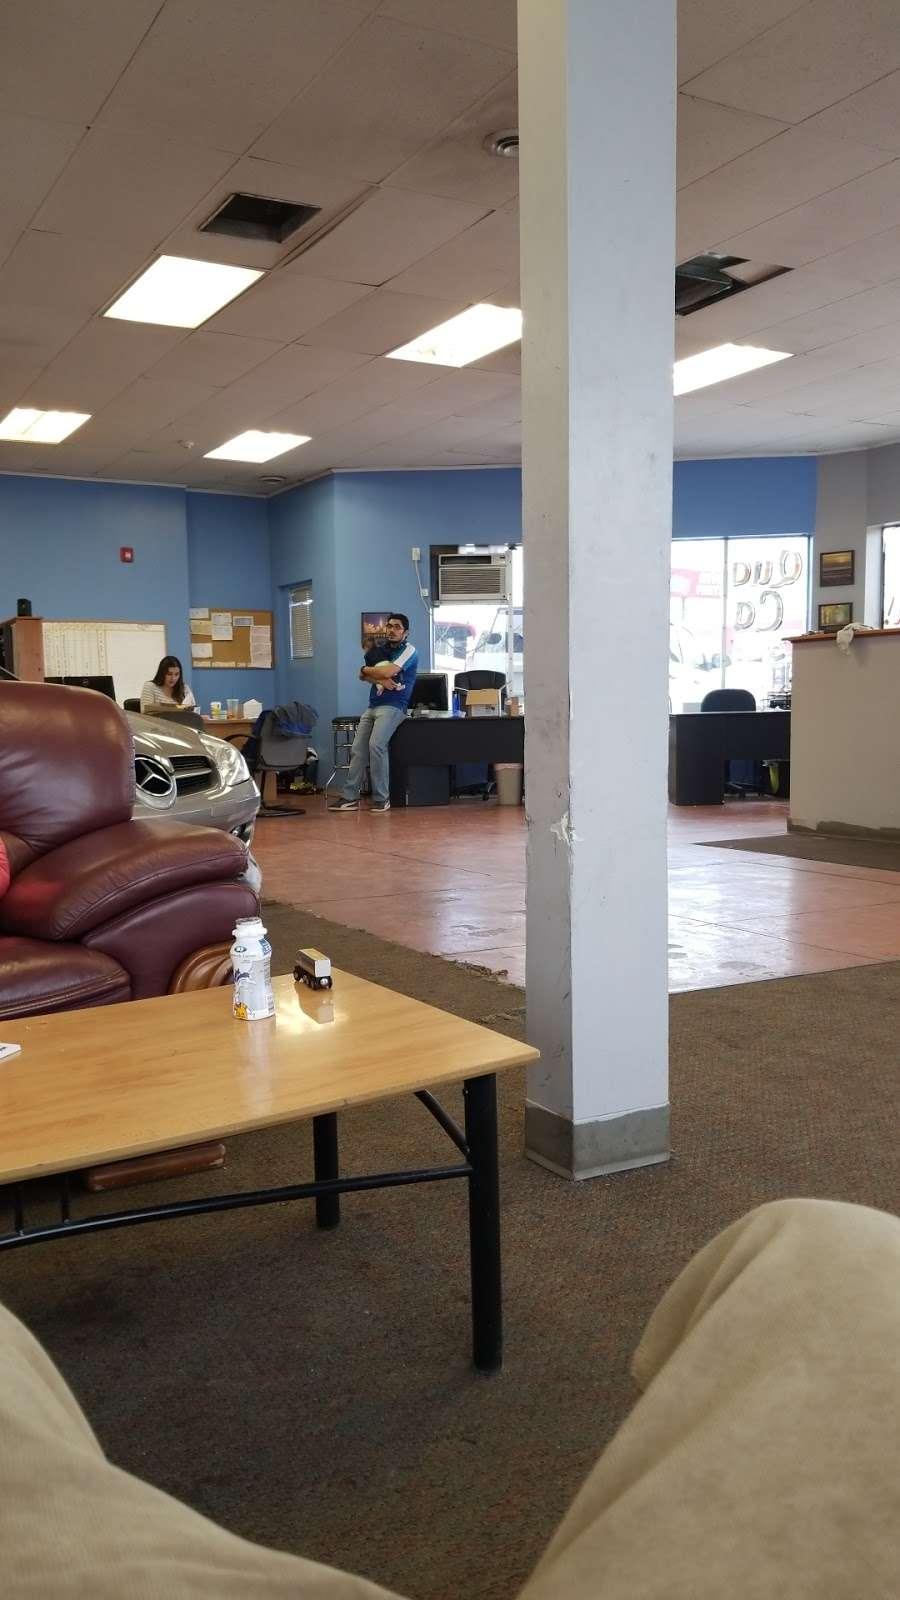 A & B Auto - car dealer  | Photo 1 of 10 | Address: 5700 W Colfax Ave, Lakewood, CO 80214, USA | Phone: (303) 274-1400